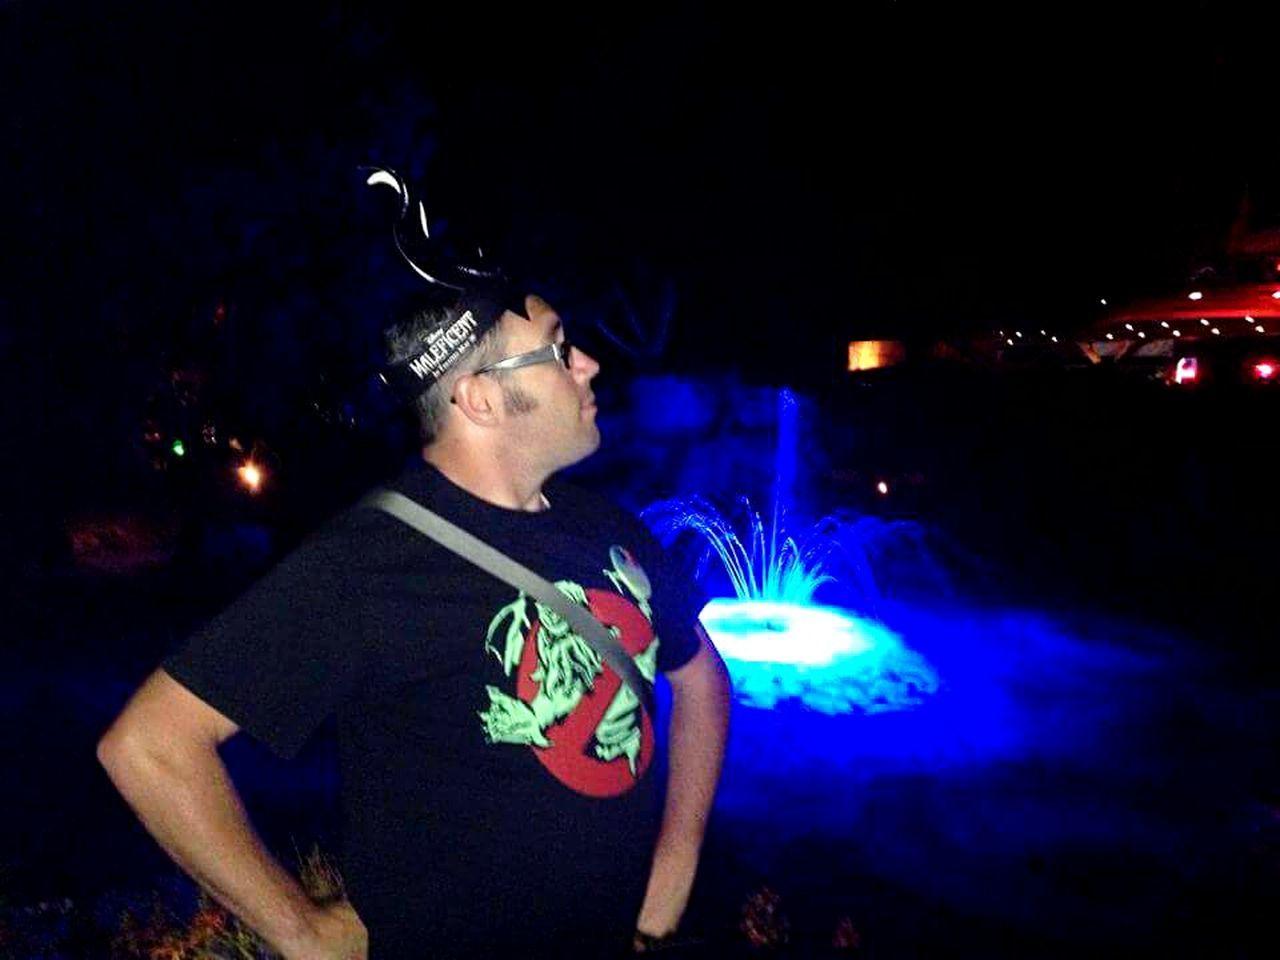 Disneyland Funwithfriends Bluefountain Neonwaters Goofing Off Cthulushirtftw Majestic Creature Soproud Waterfountain Nightphotography Night View Nightlife Disneylovers Bestfriends ♡ Sillyart